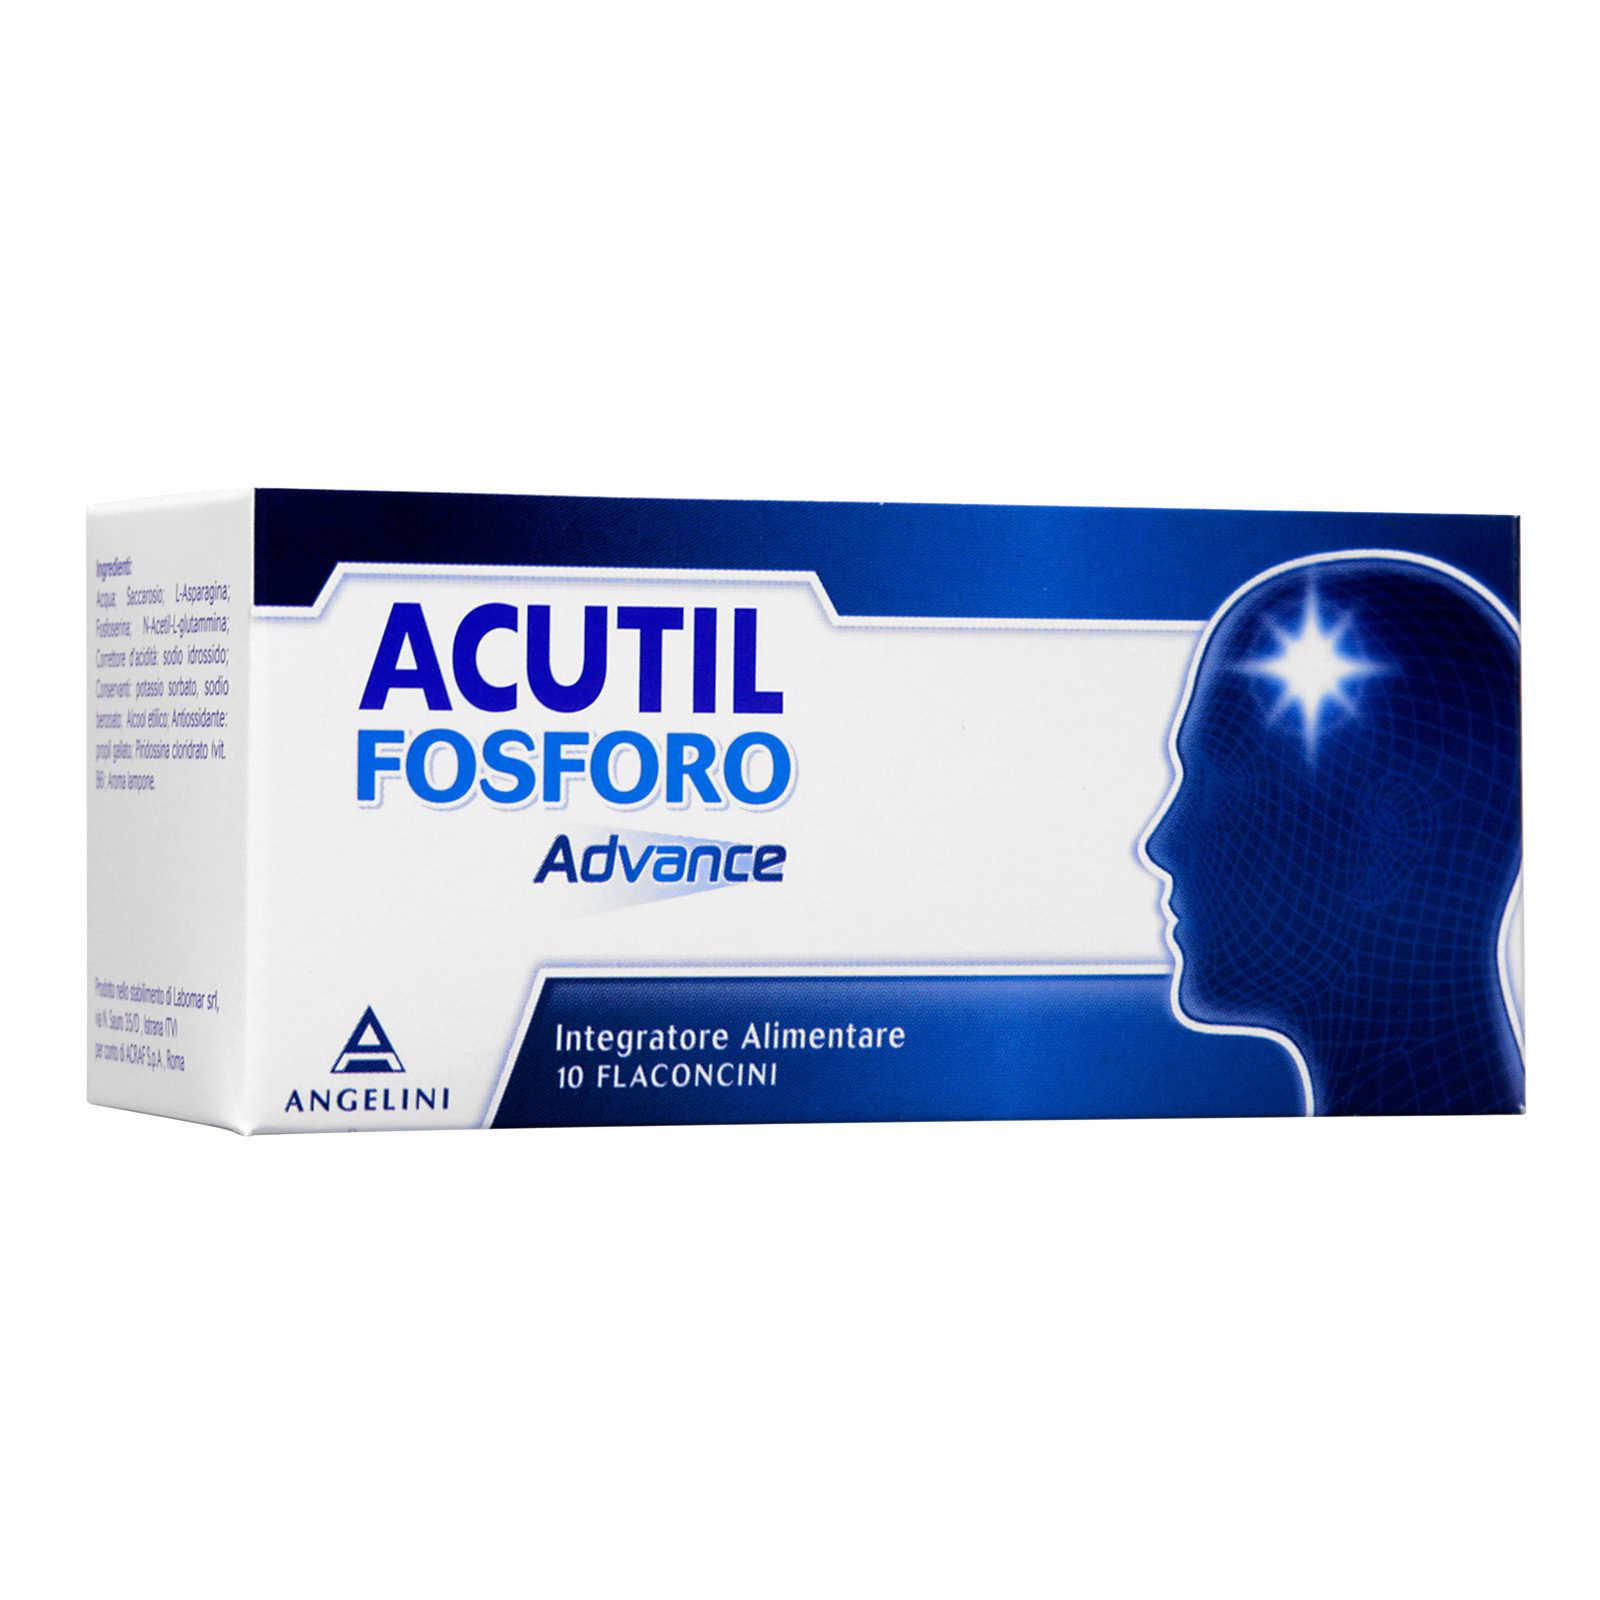 Acutil - Fosforo Advance in Flaconcini